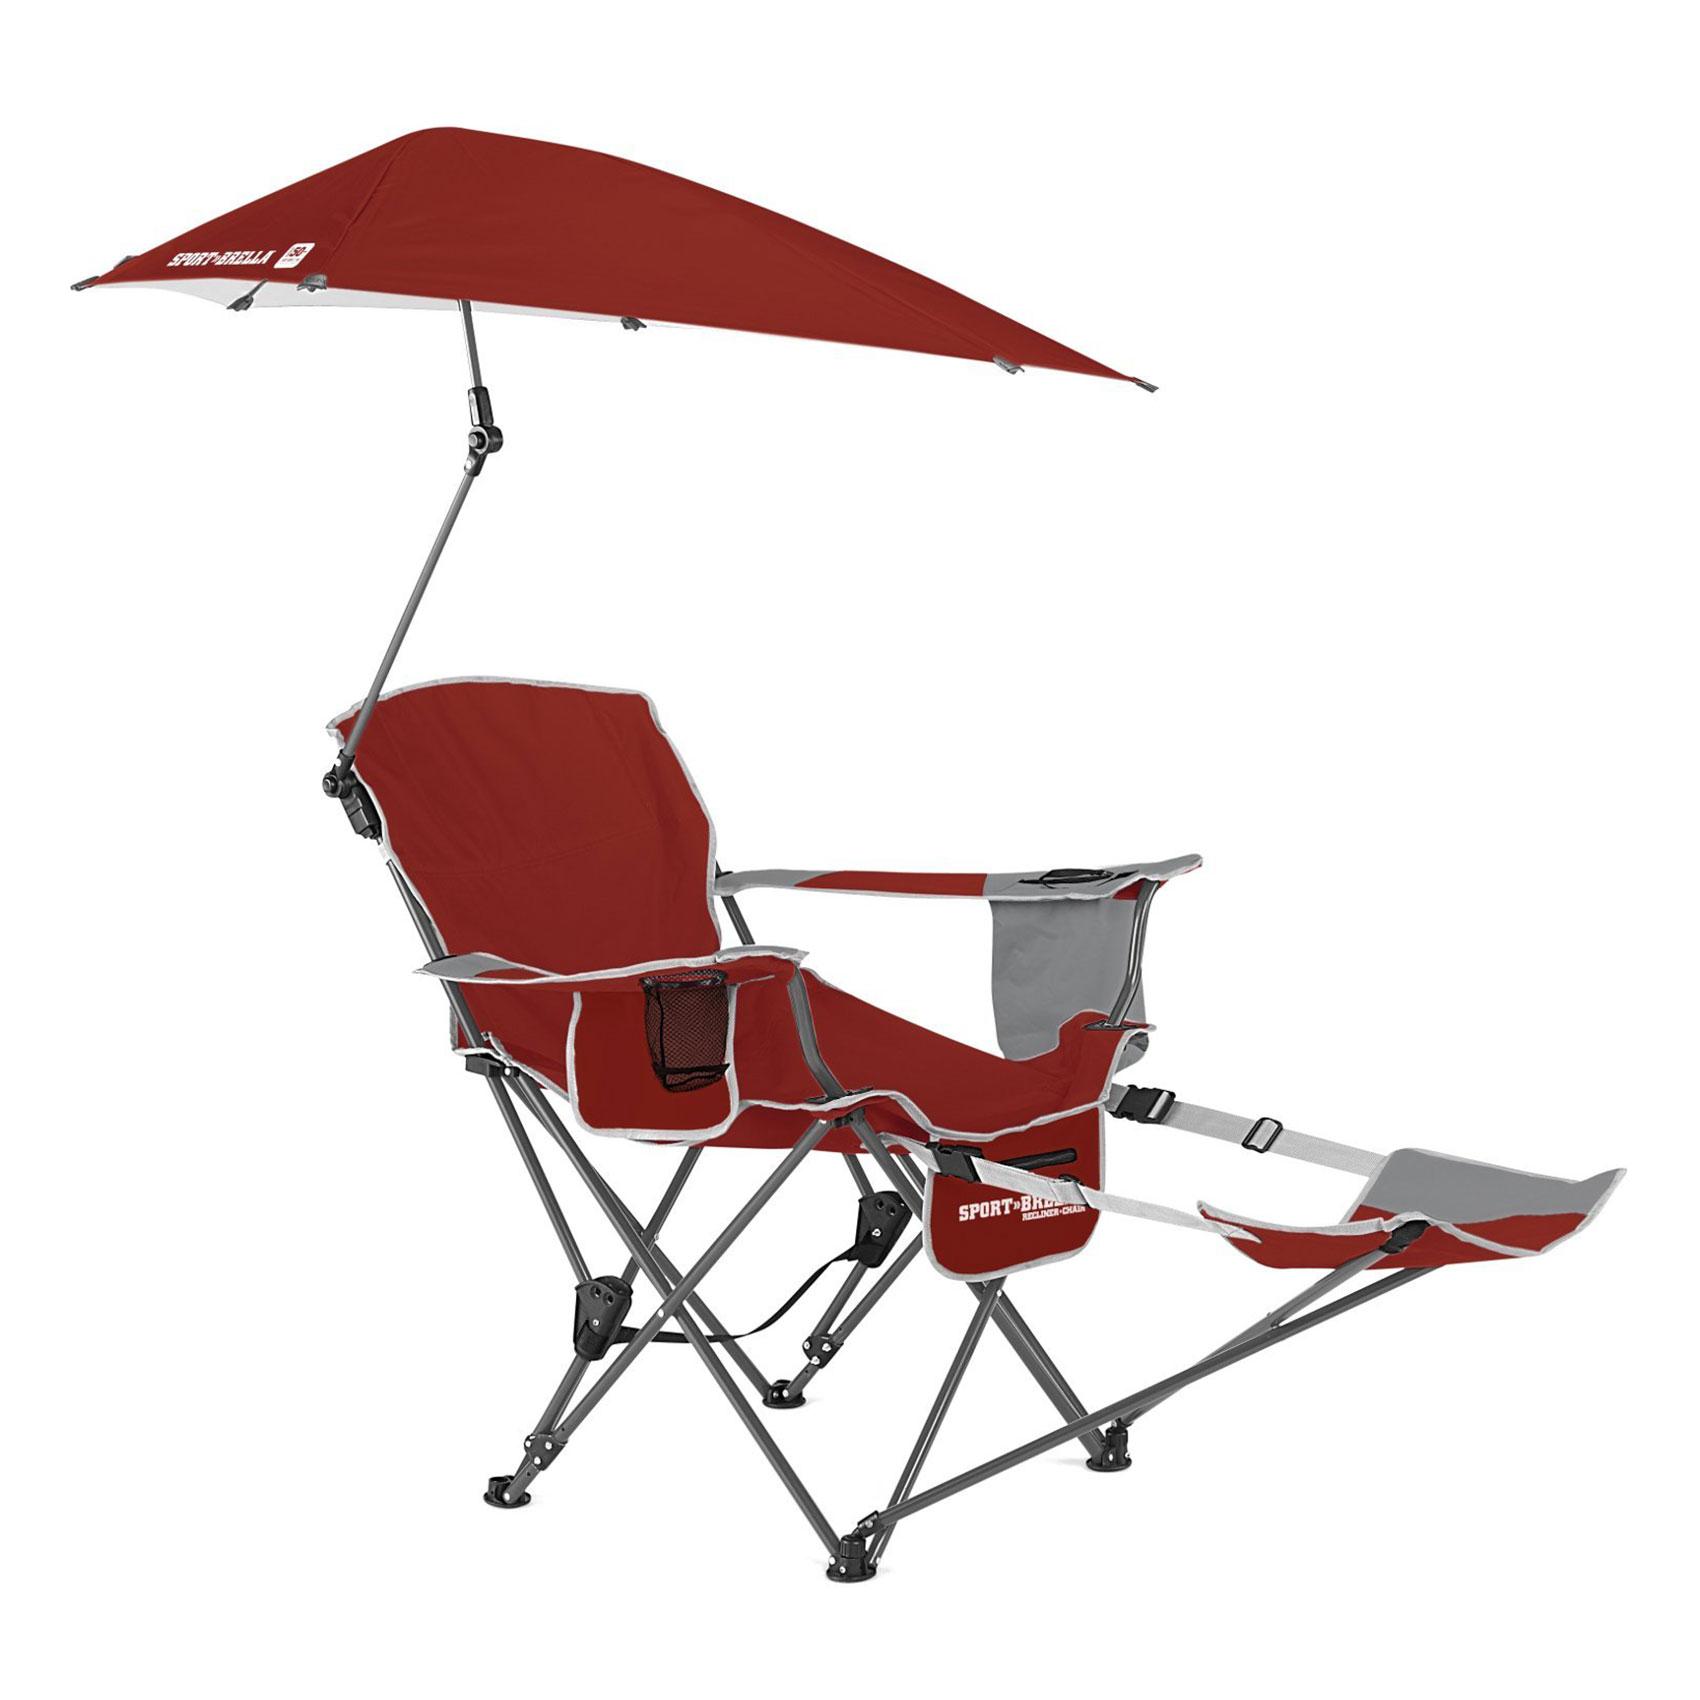 Sport Brella Portable Sun Shelter Weather Umbrella Recliner Folding Chair Red